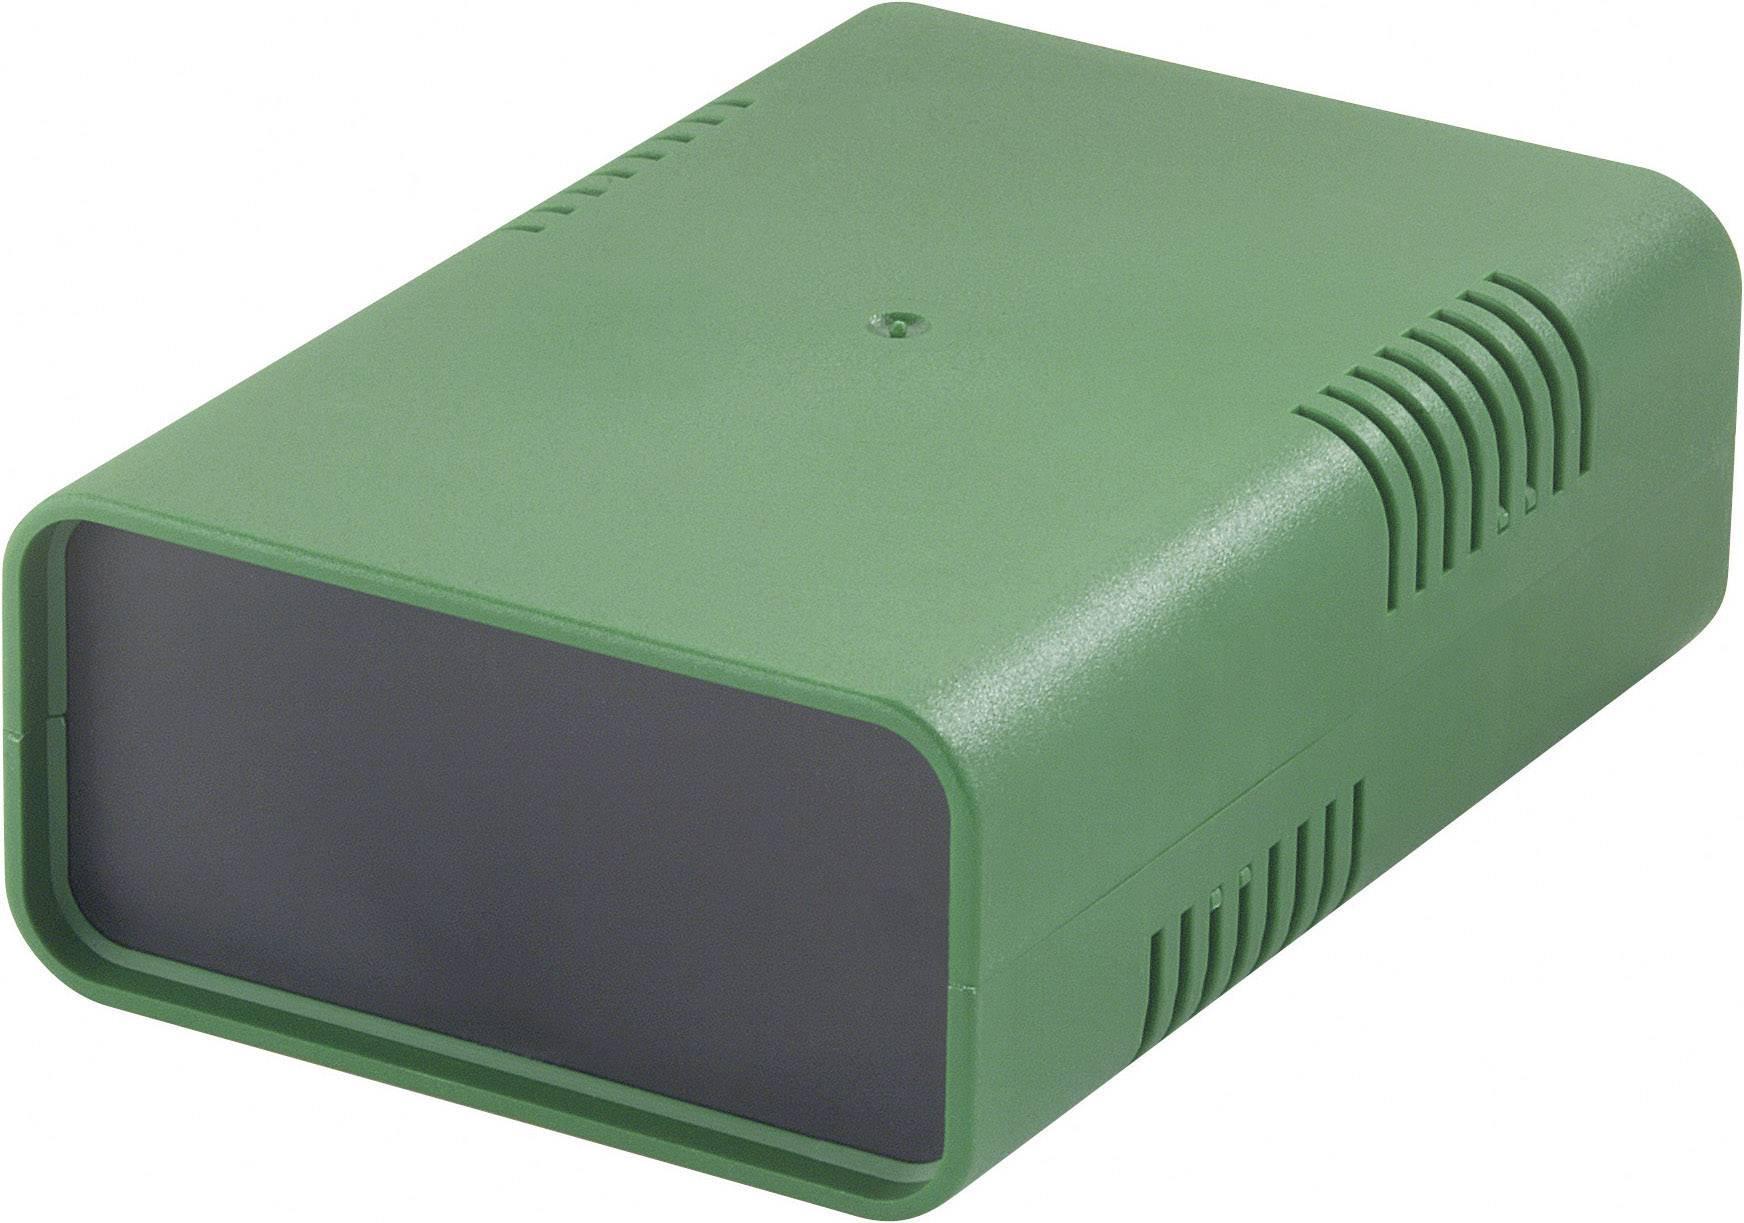 Univerzálne púzdro 523107, 135 x 95 x 45 , polystyrén, zelená, 1 ks